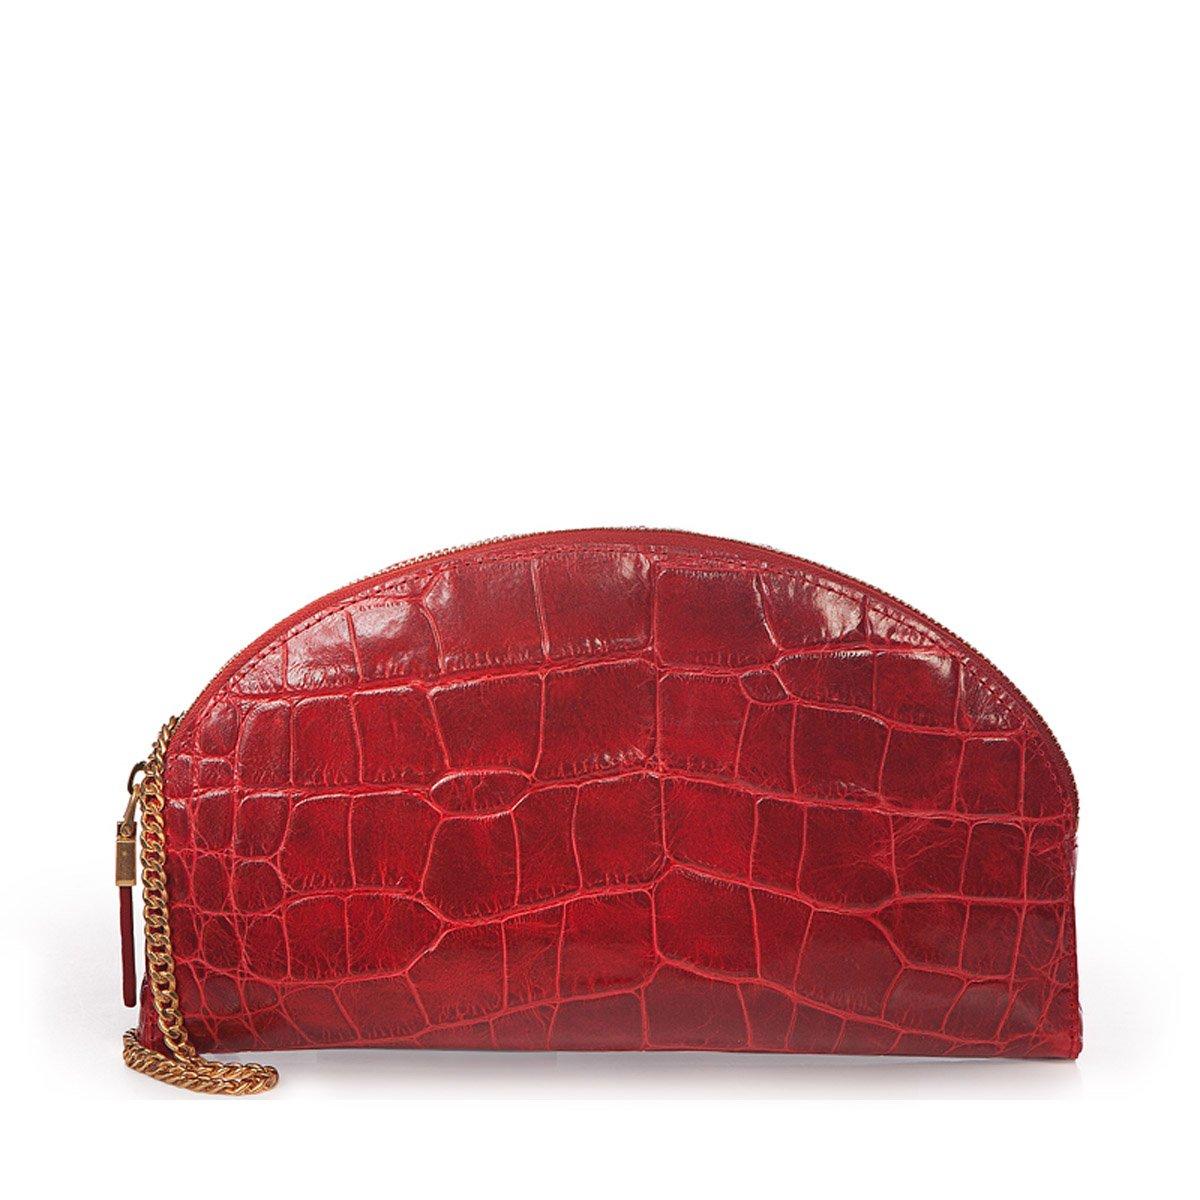 Eric Javits Luxury Designer Women's Fashion Handbag - Leather Croissant - Red by Eric Javits